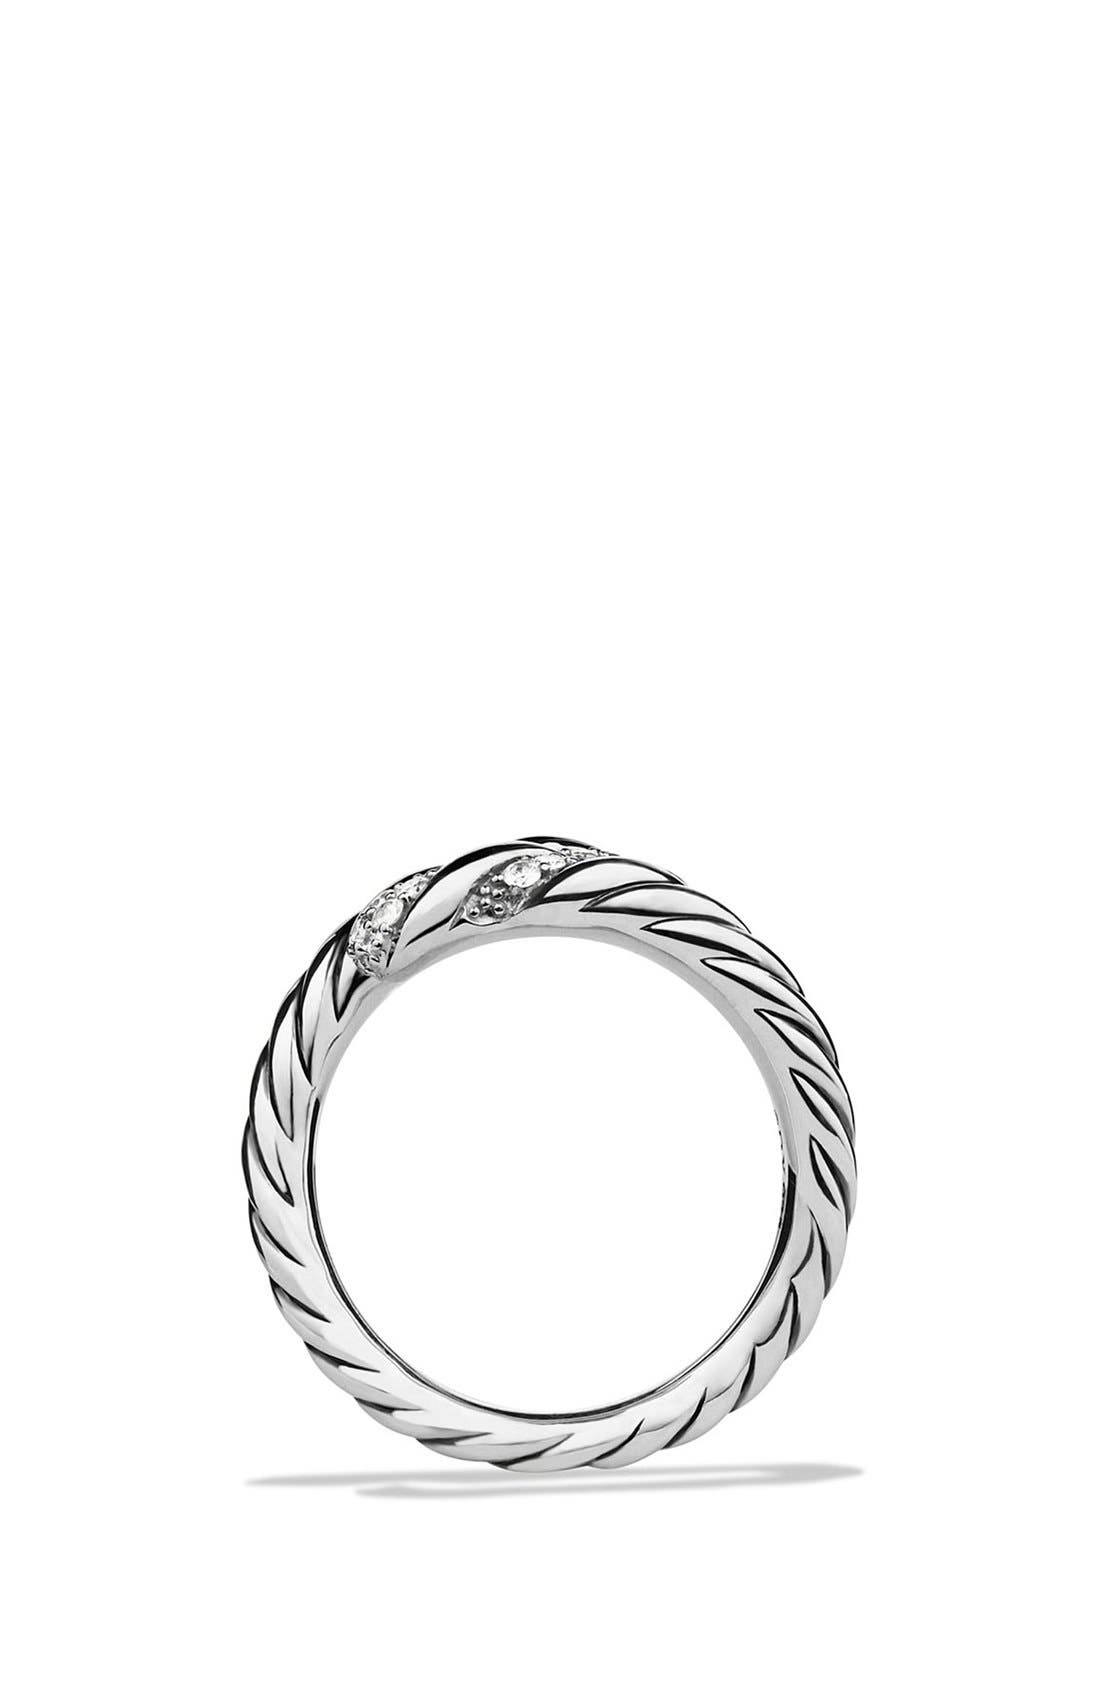 Alternate Image 2  - David Yurman 'Willow' Open Single Row Ring with Diamonds